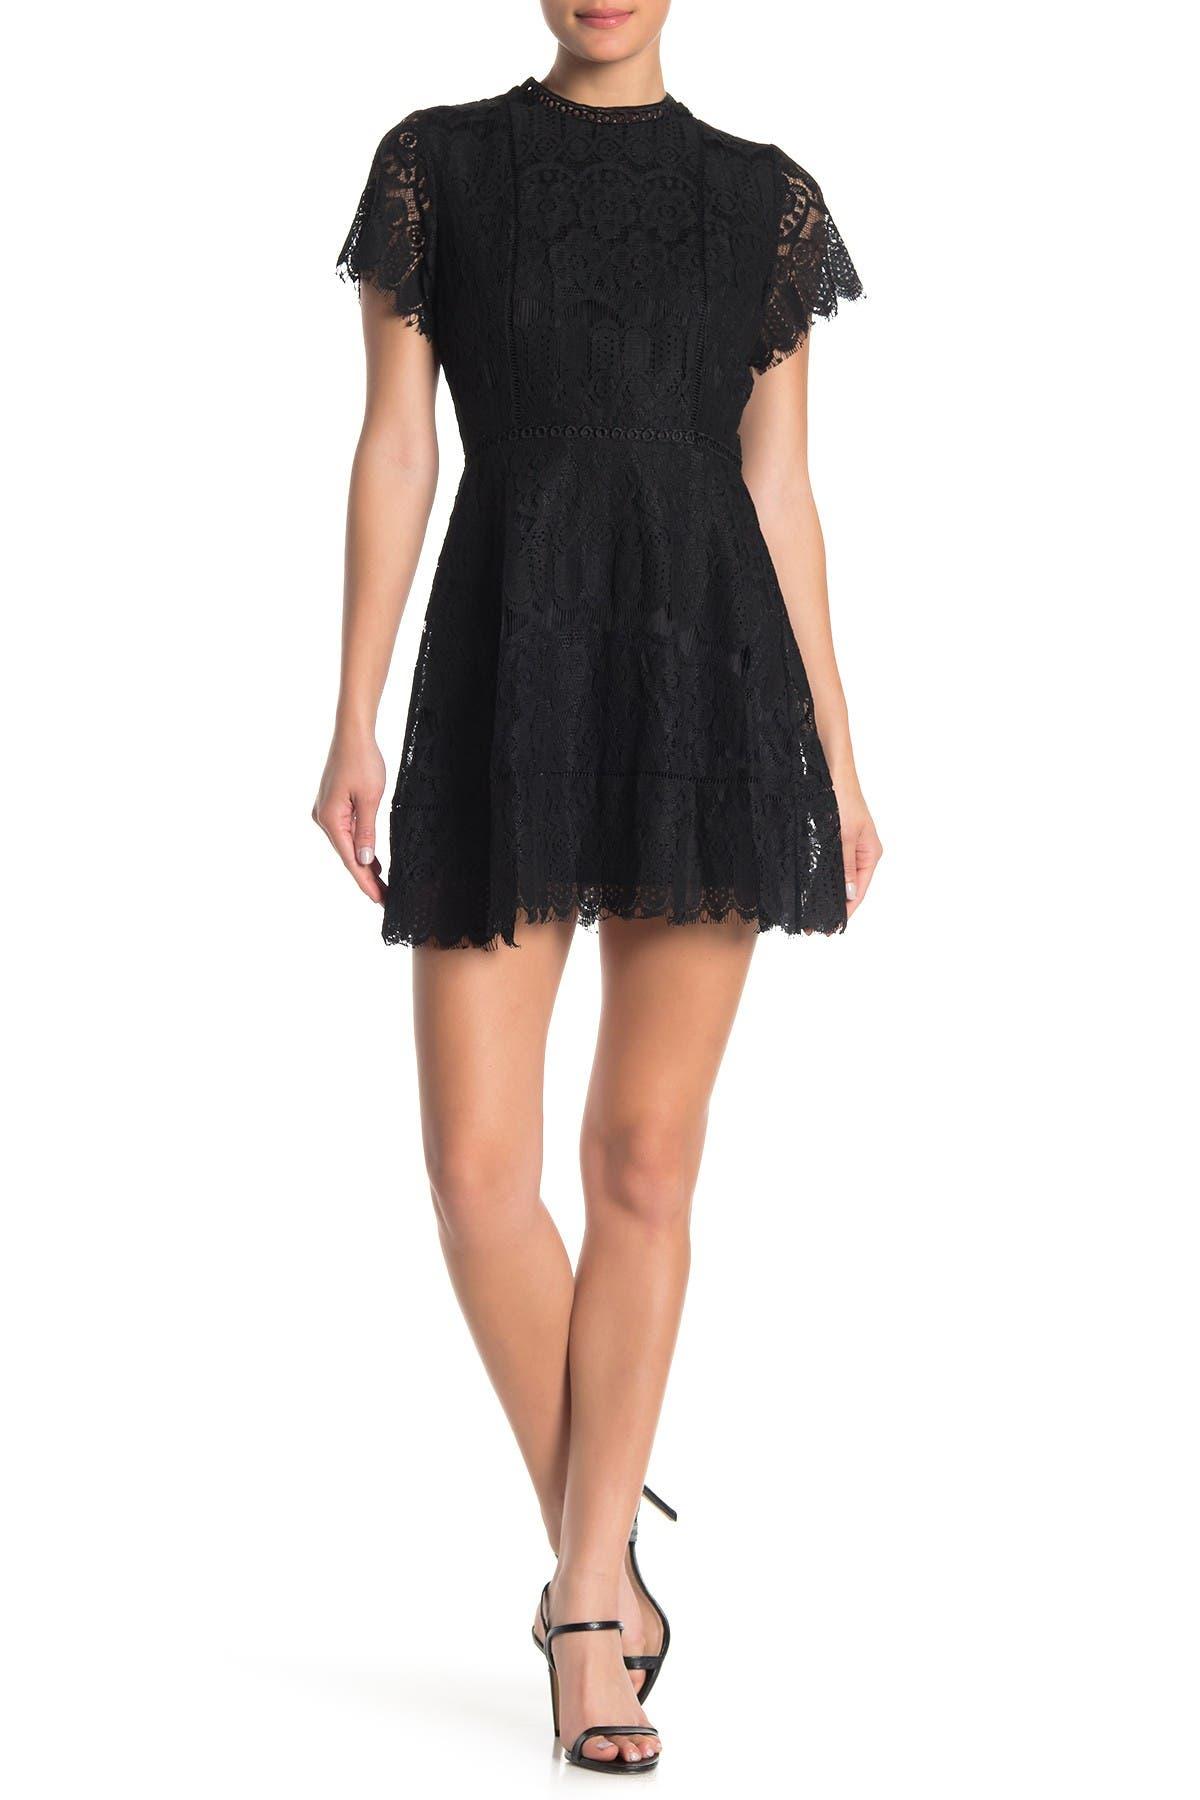 Image of Blu Pepper Mock Neck Lace Dress